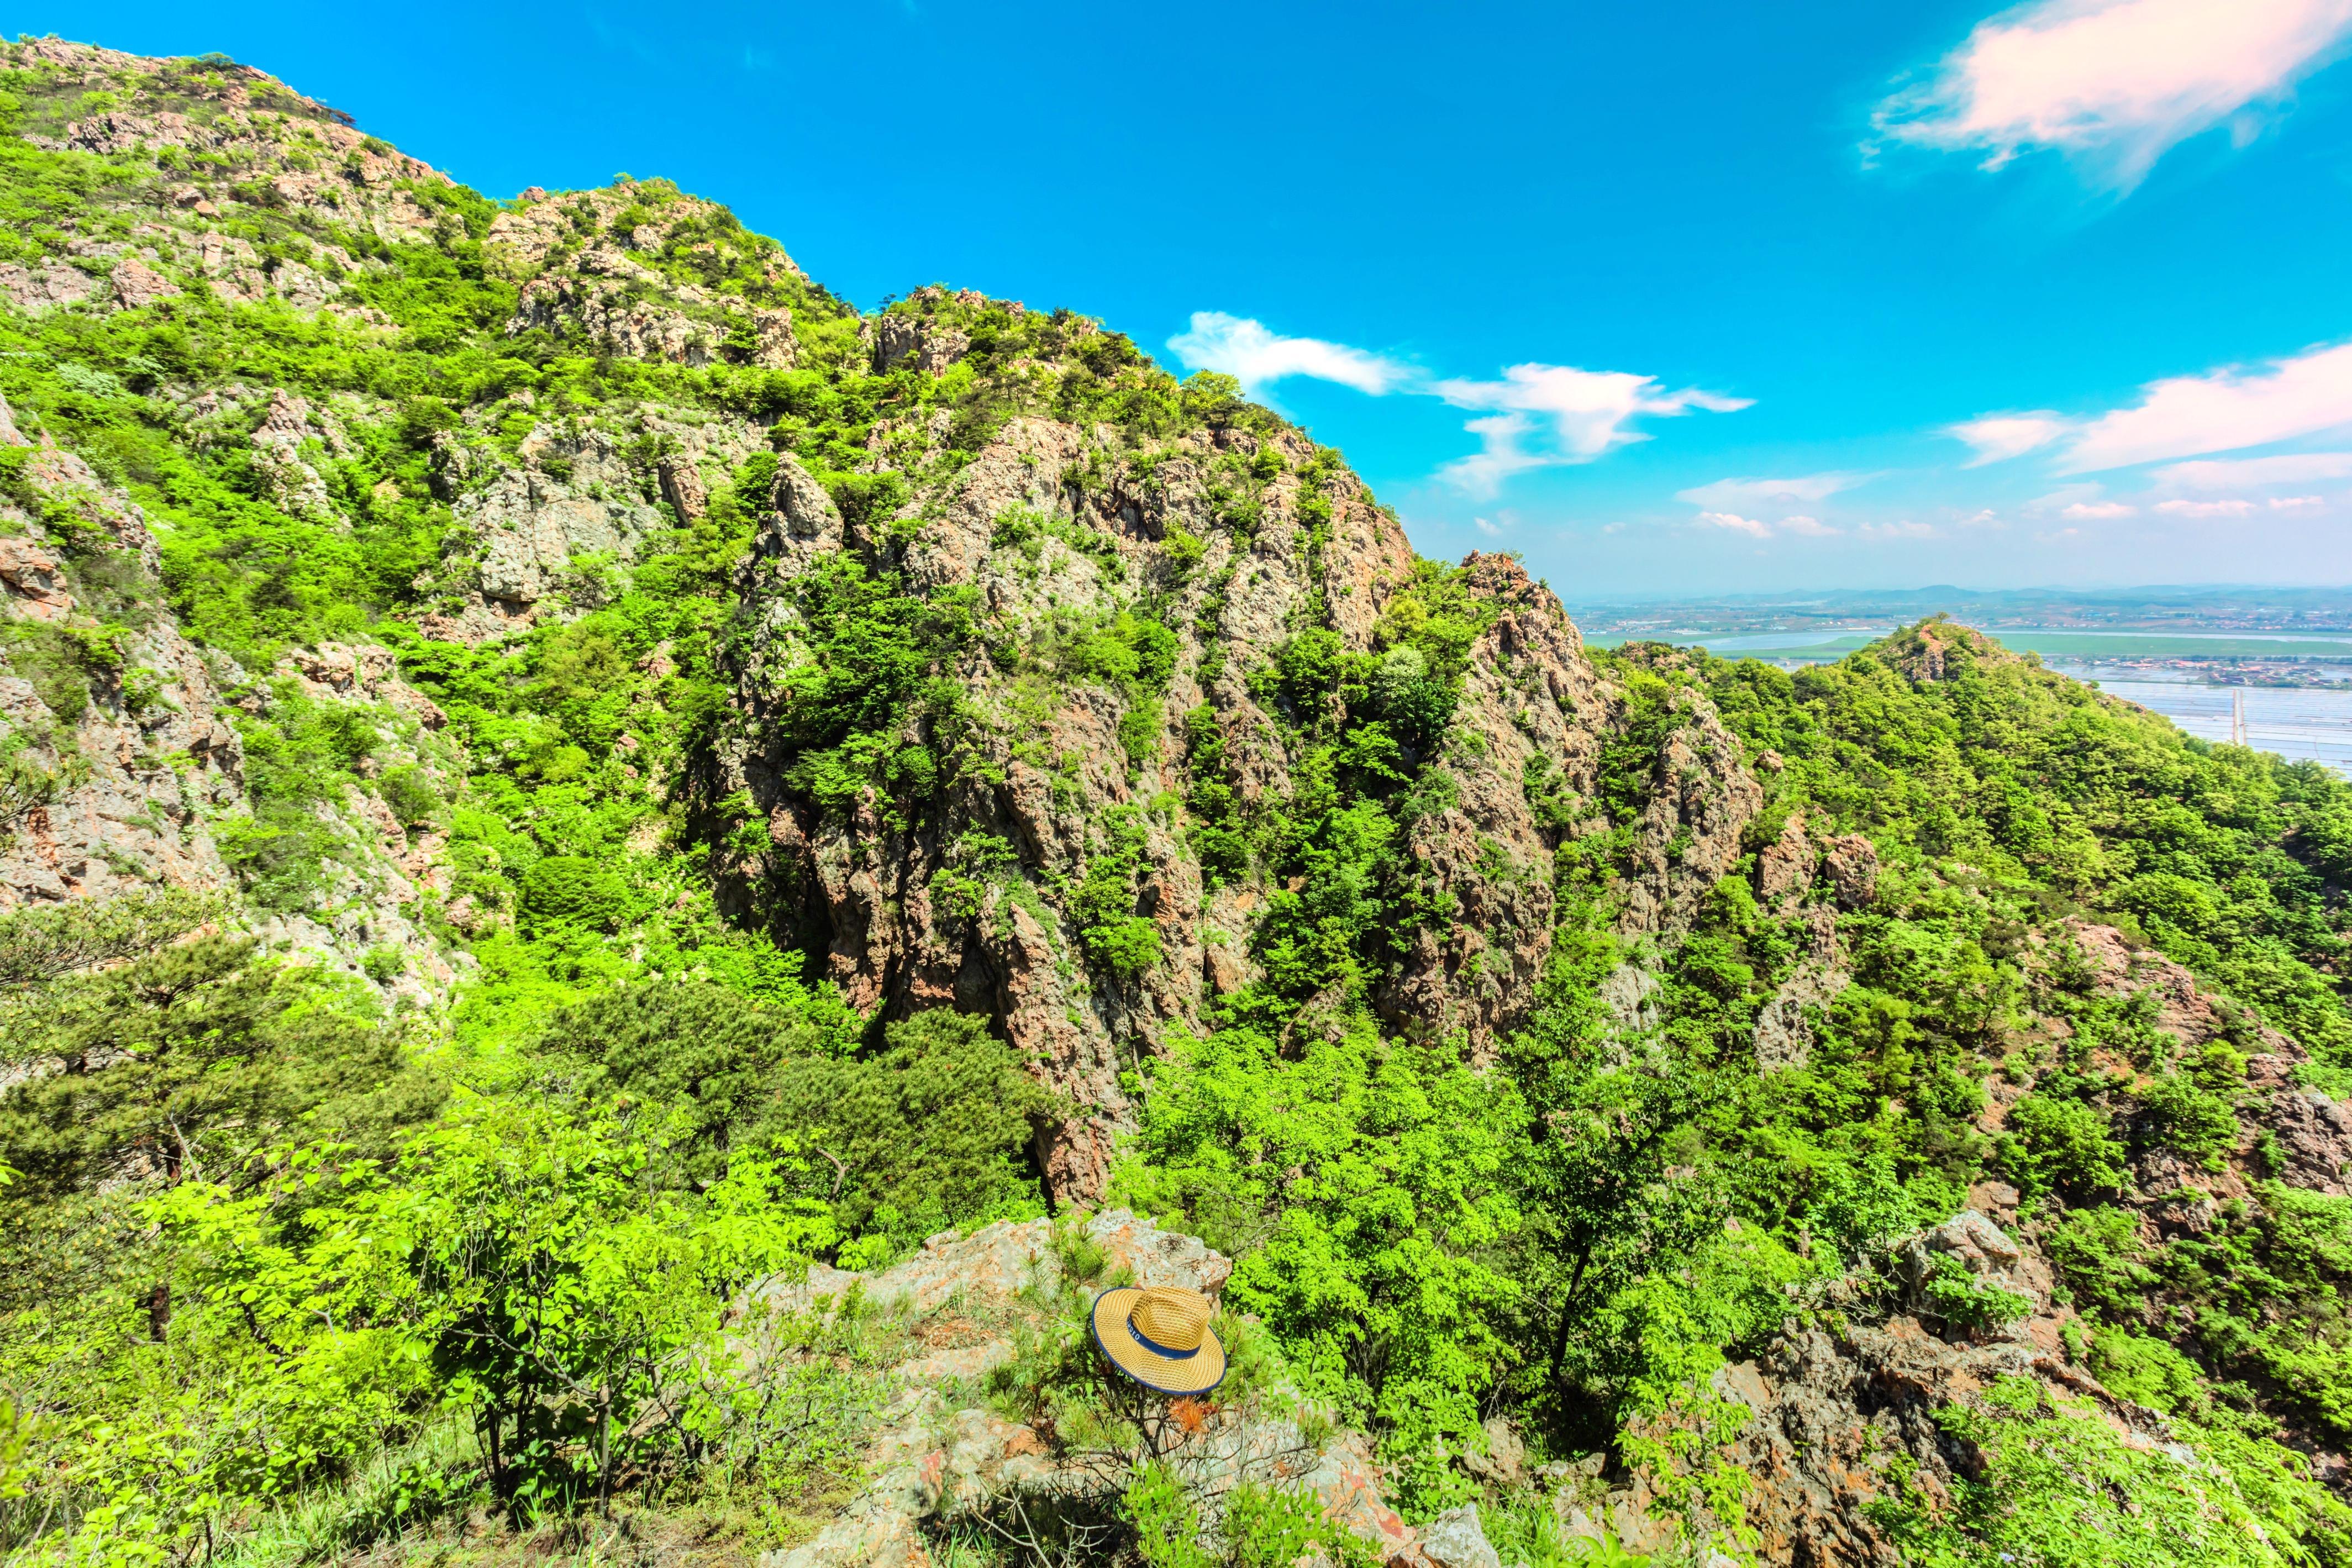 Dagu (Great Loneliness) Mountain